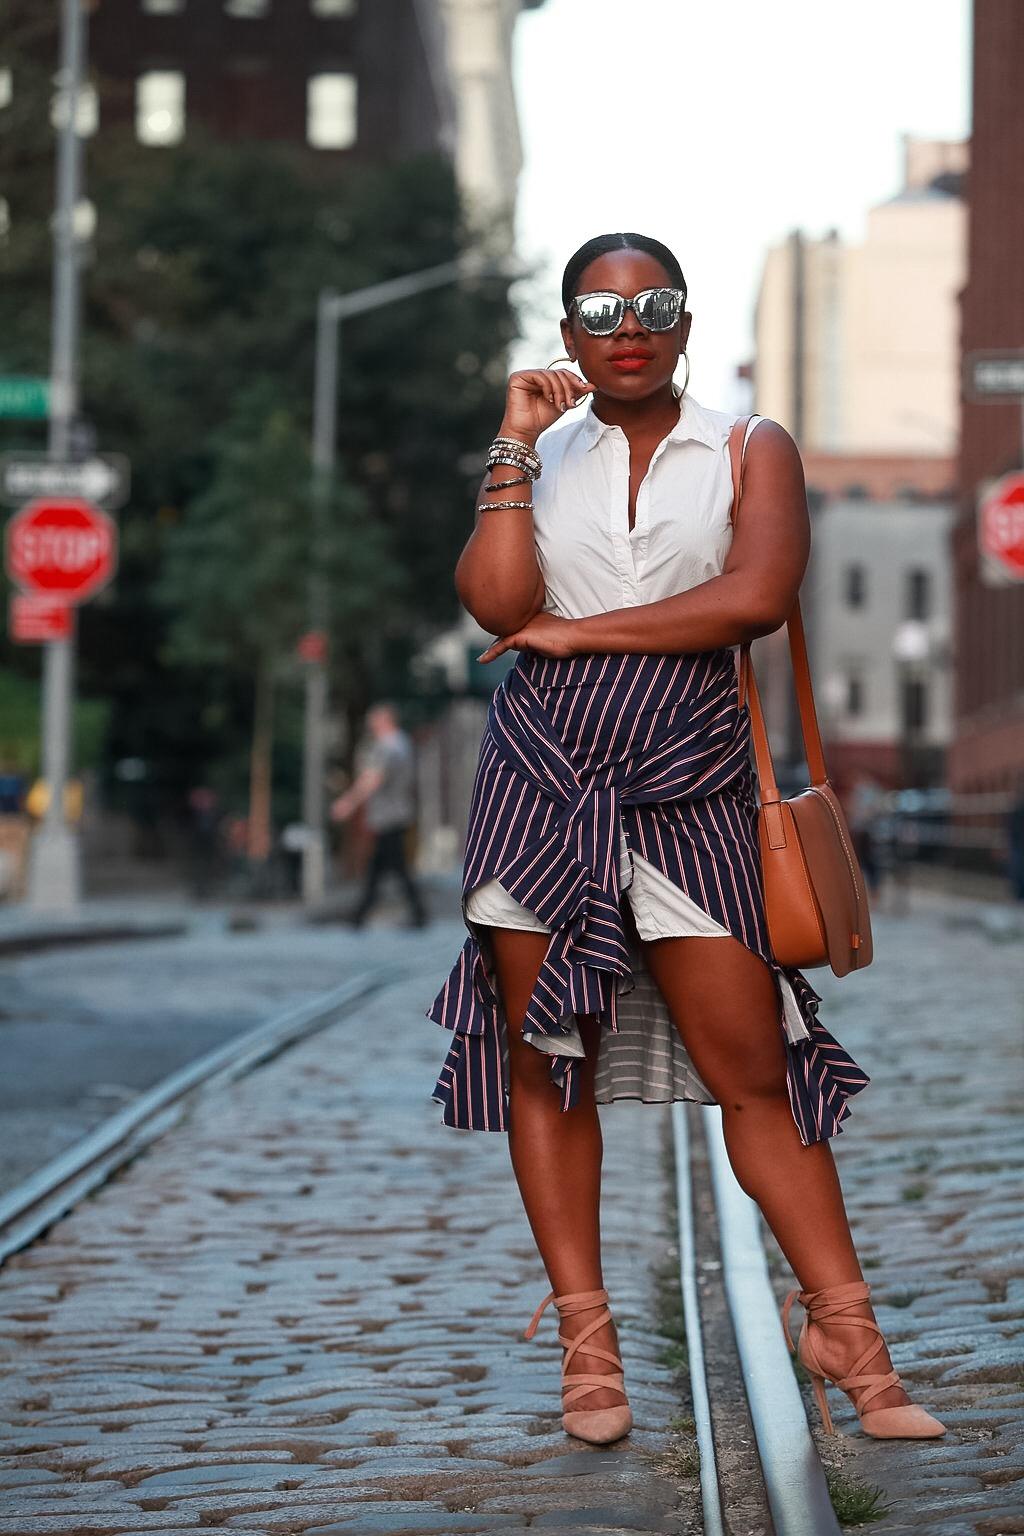 ShirtDress: H&M   Skirt: Necessary Clothing   Hoops: Delicate Raymond Jewelry   Sunglasses: Mahps Vintage   Bangles:Vintage   Bag: Gap   Heels: Aldo       Photographer: Leidy Beltran  (@leidybeltran )      xx- Christian Joy